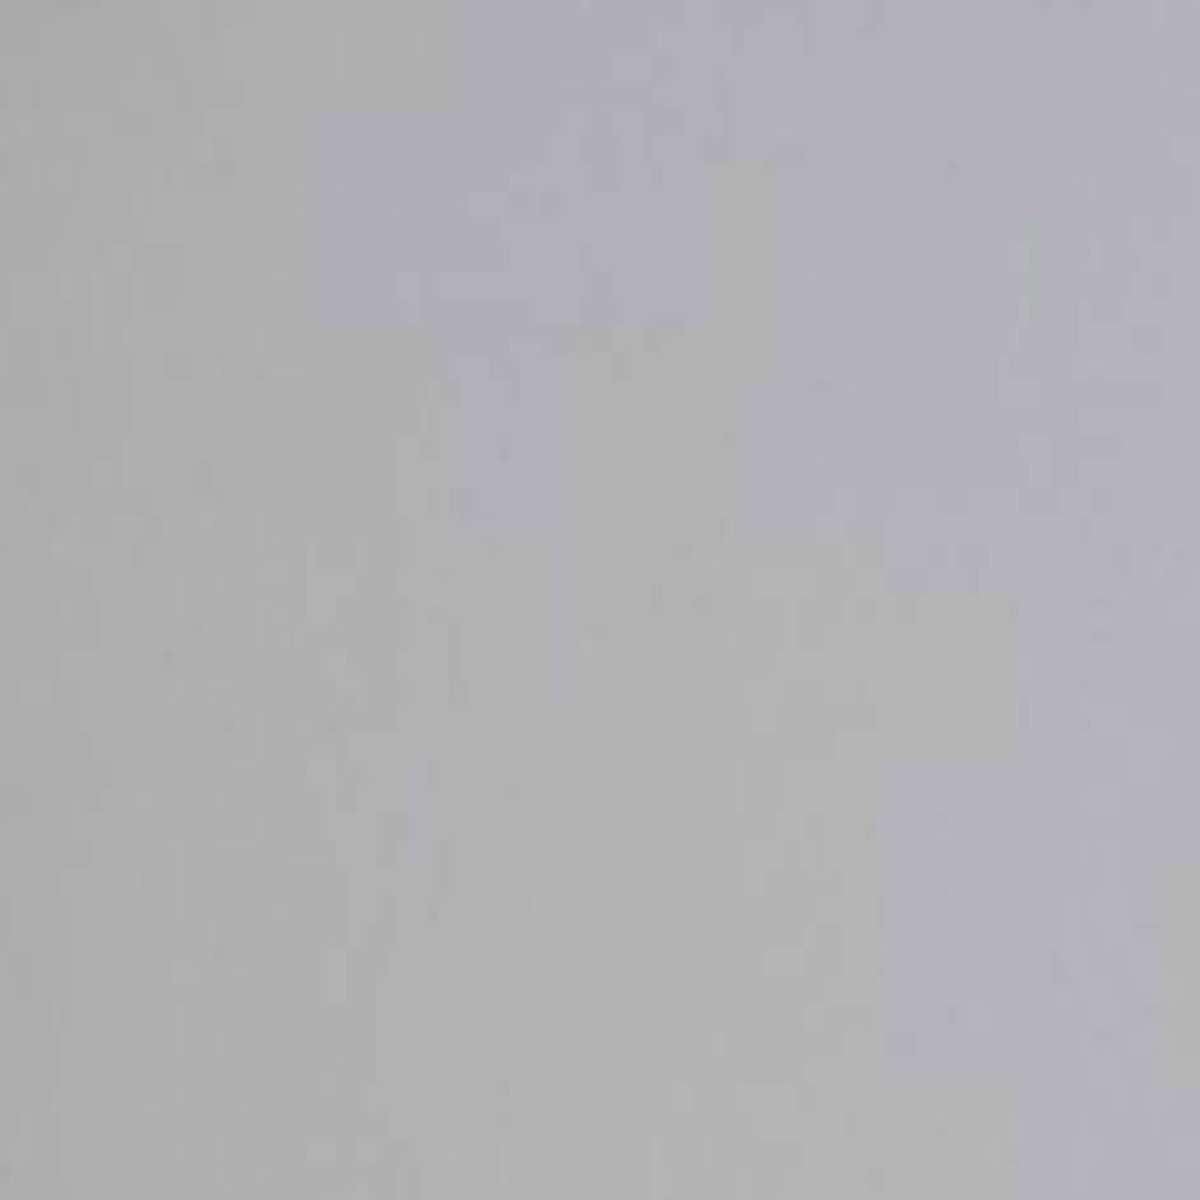 Placa em EVA | 60x40cm Cinza 1,8mm Pct.c/10 - Dubflex